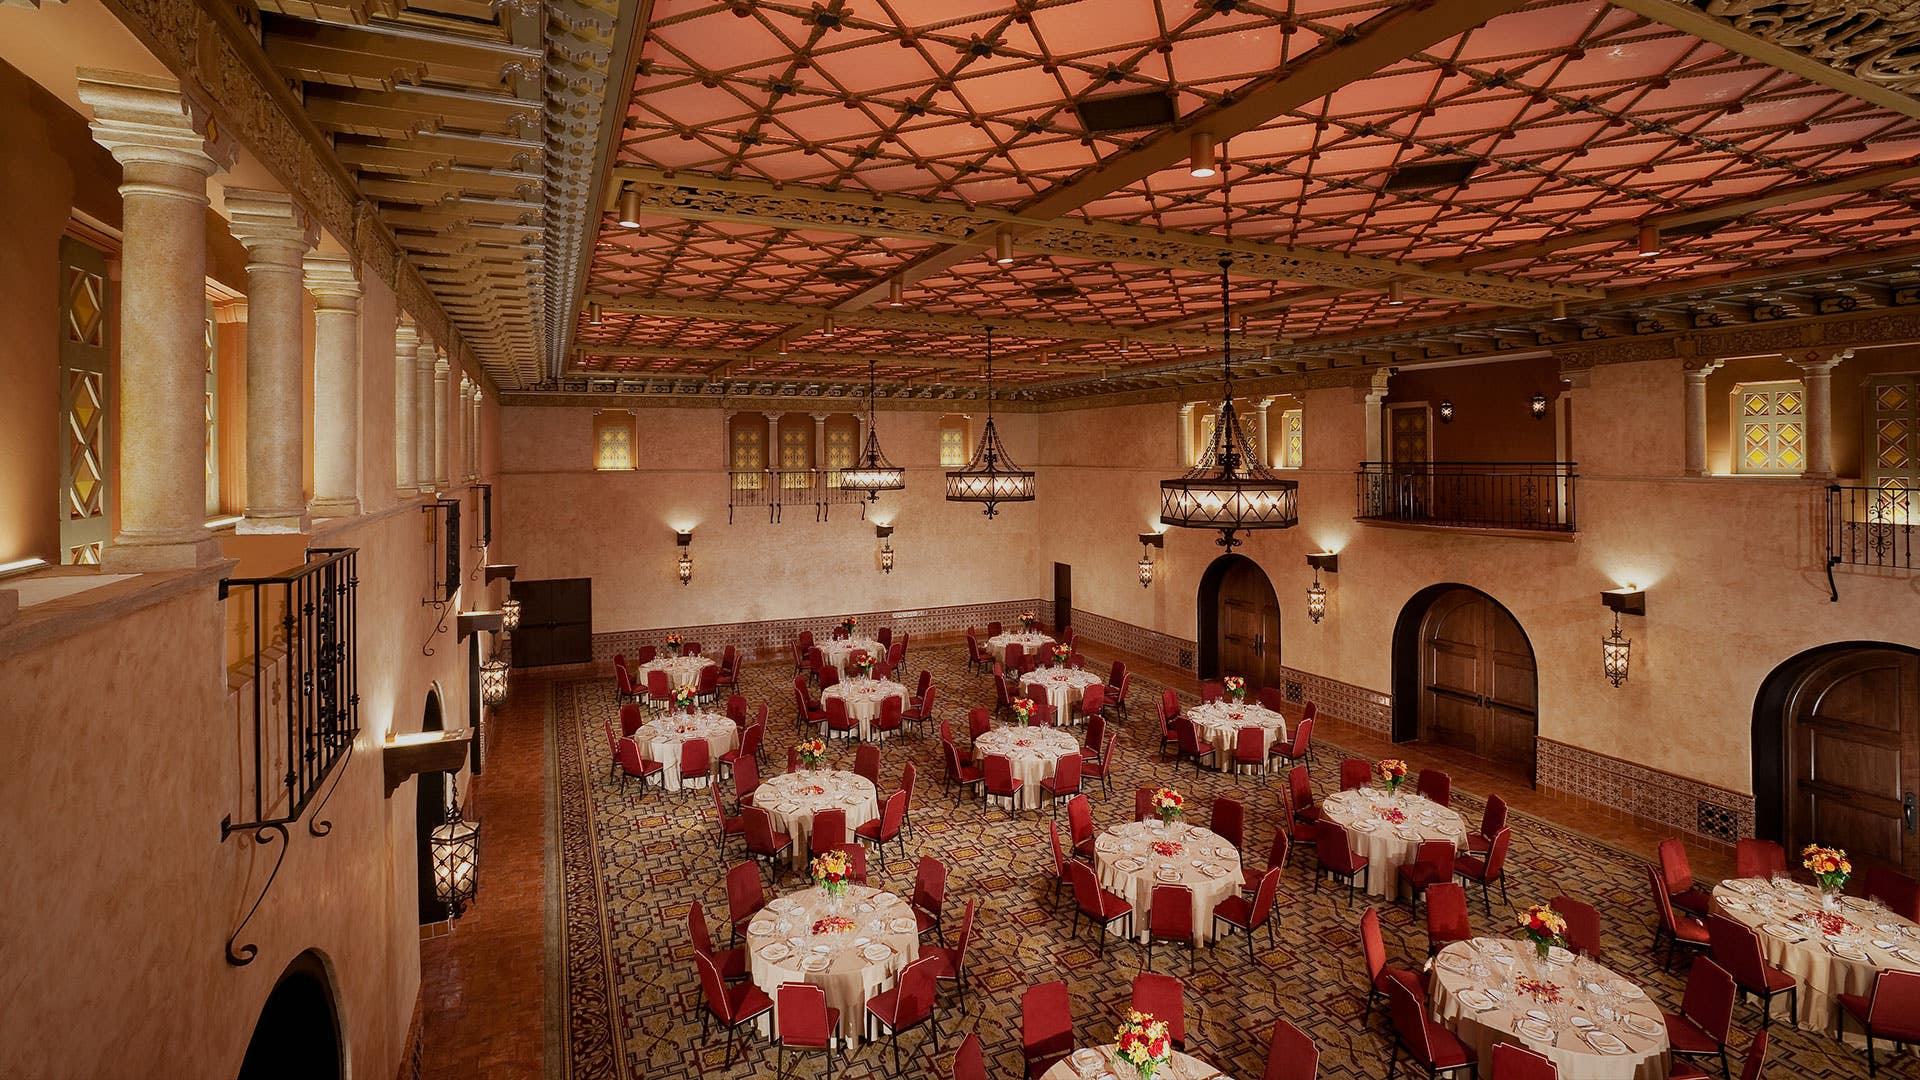 Blossom Ballroom at the Hollywood Roosevelt Hotel